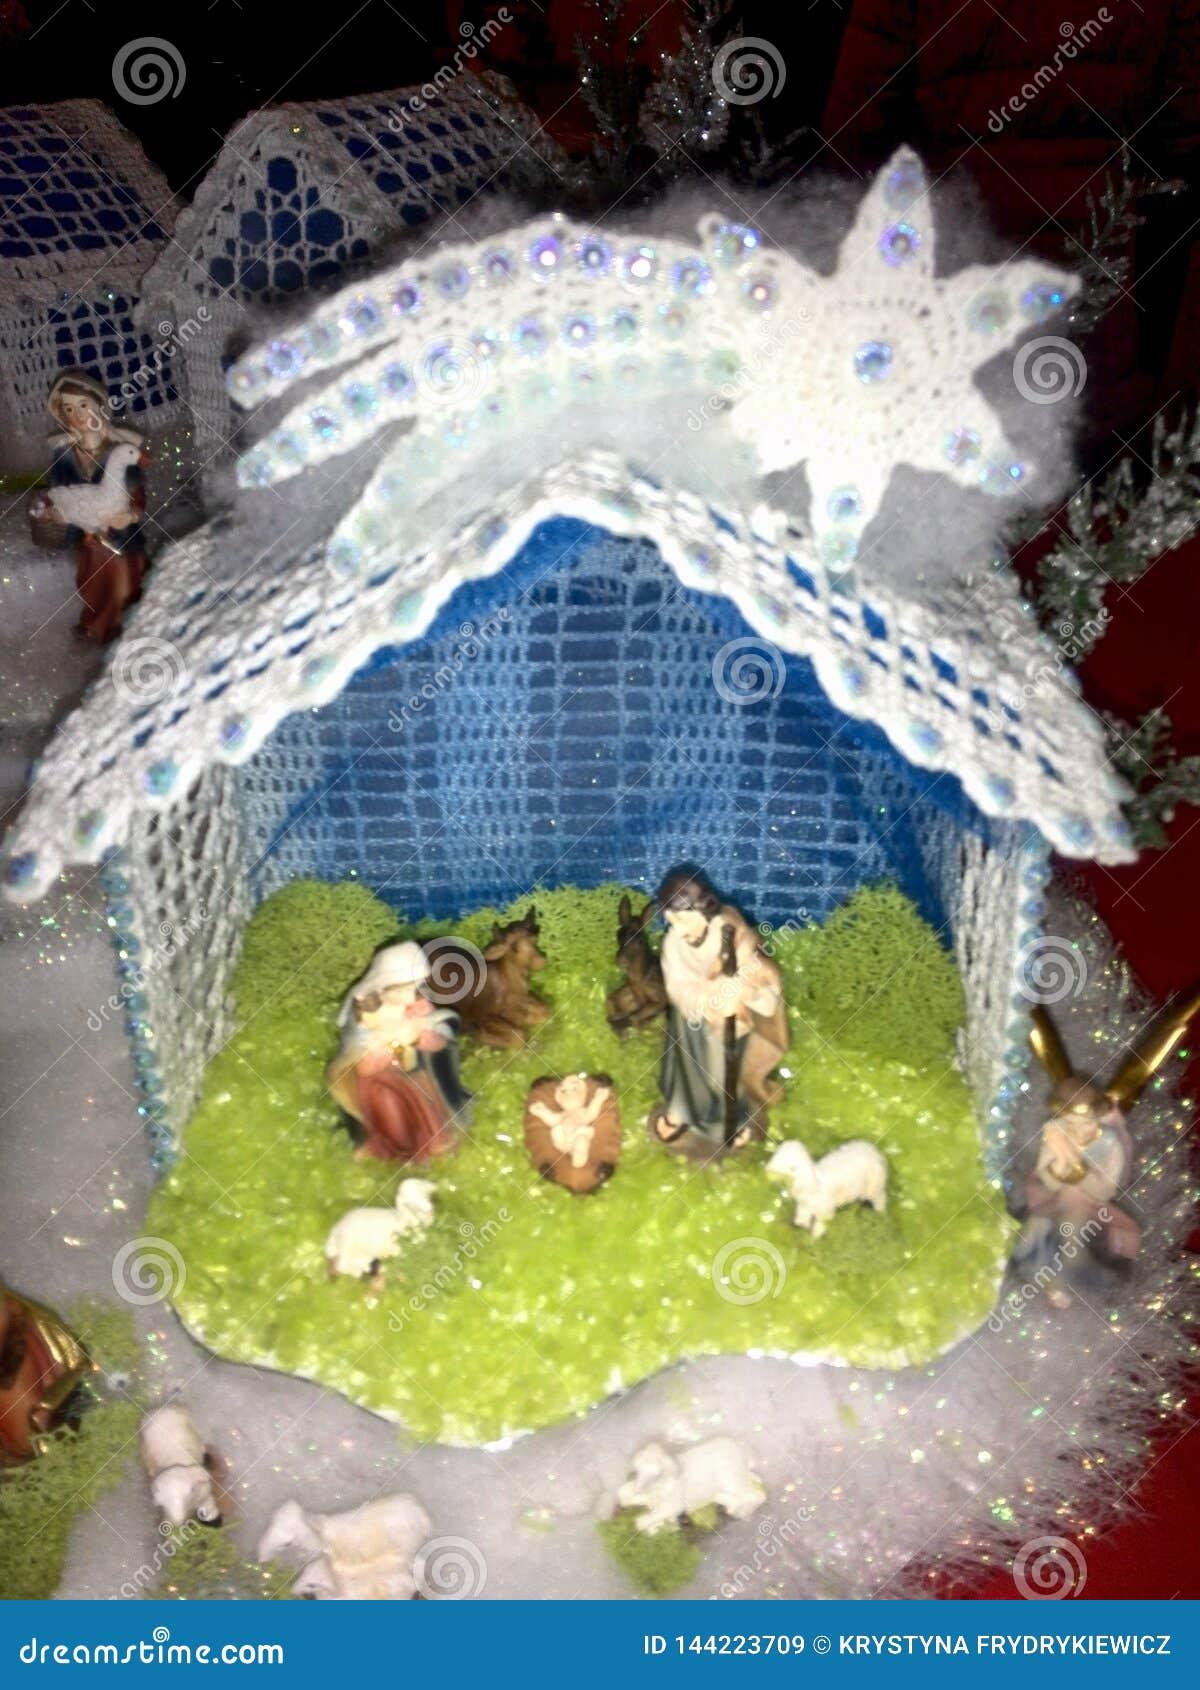 Crochet Christmas nativity